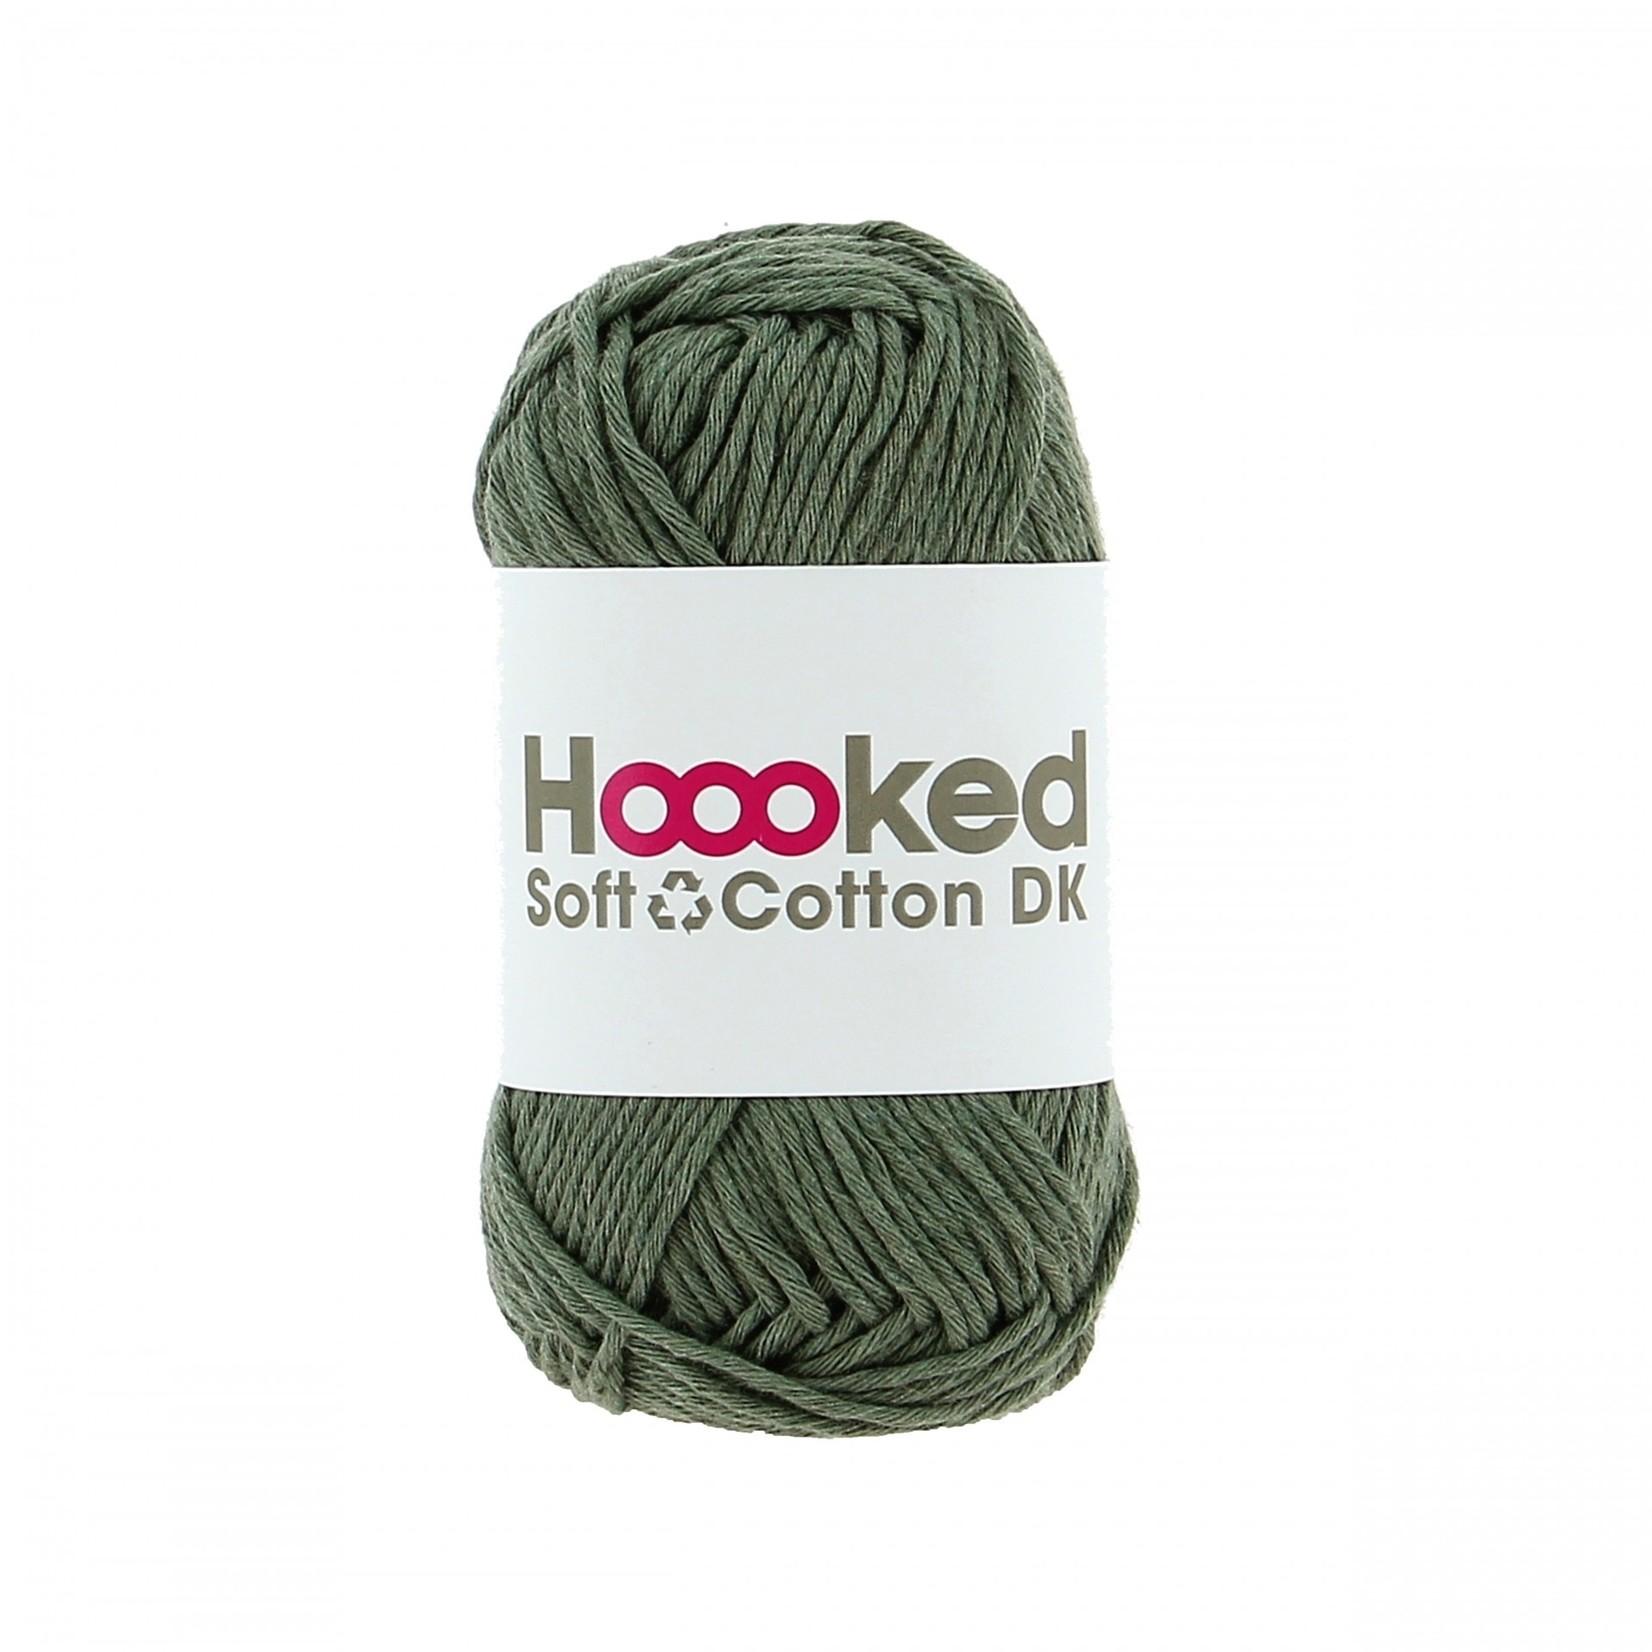 Hoooked HoookedSoft Cotton DK Paramaribo Palm 50 gr. / 85 m.